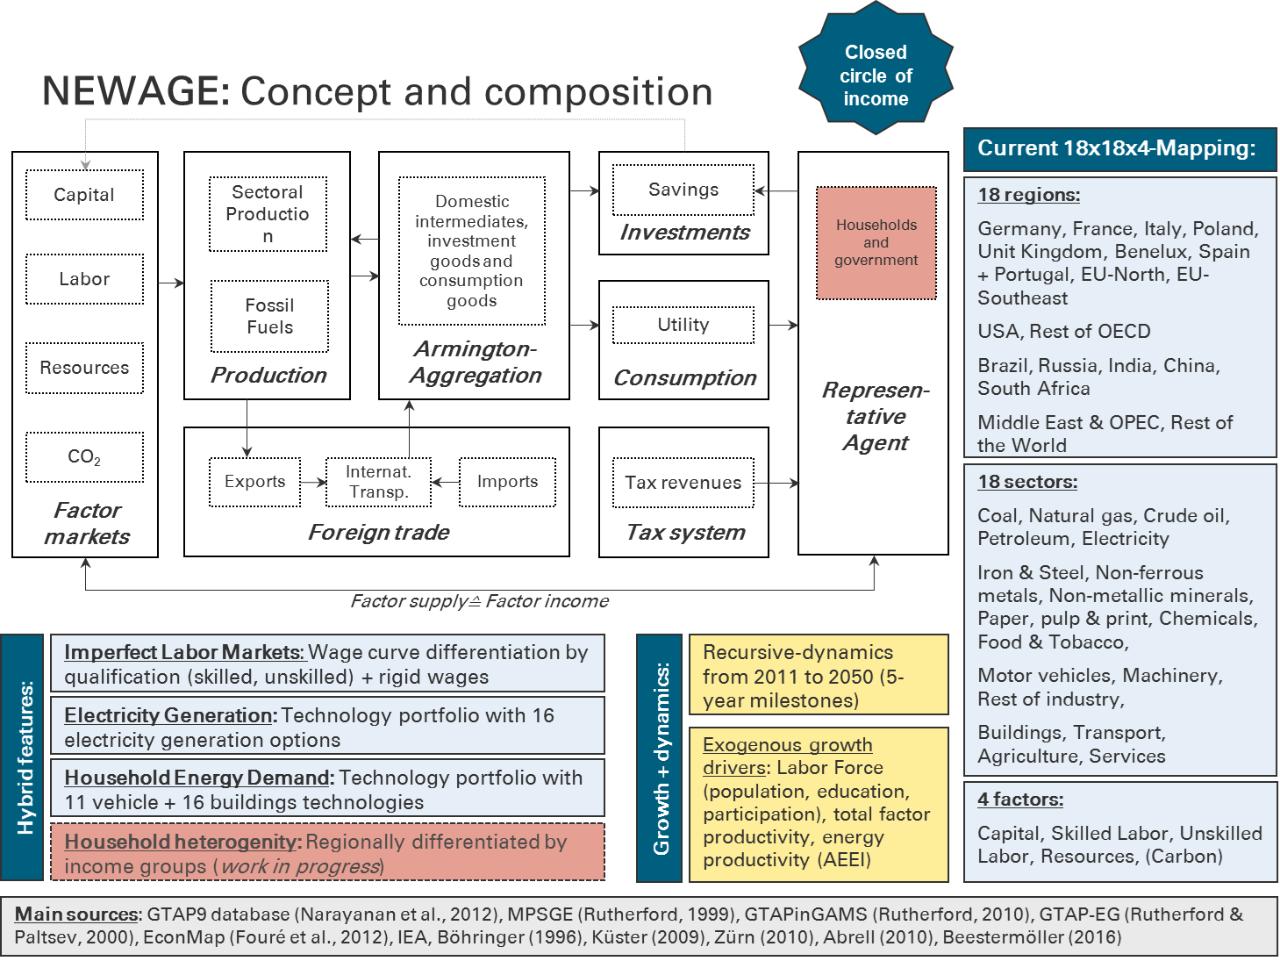 NEWAGE – General model description | University of Stuttgart